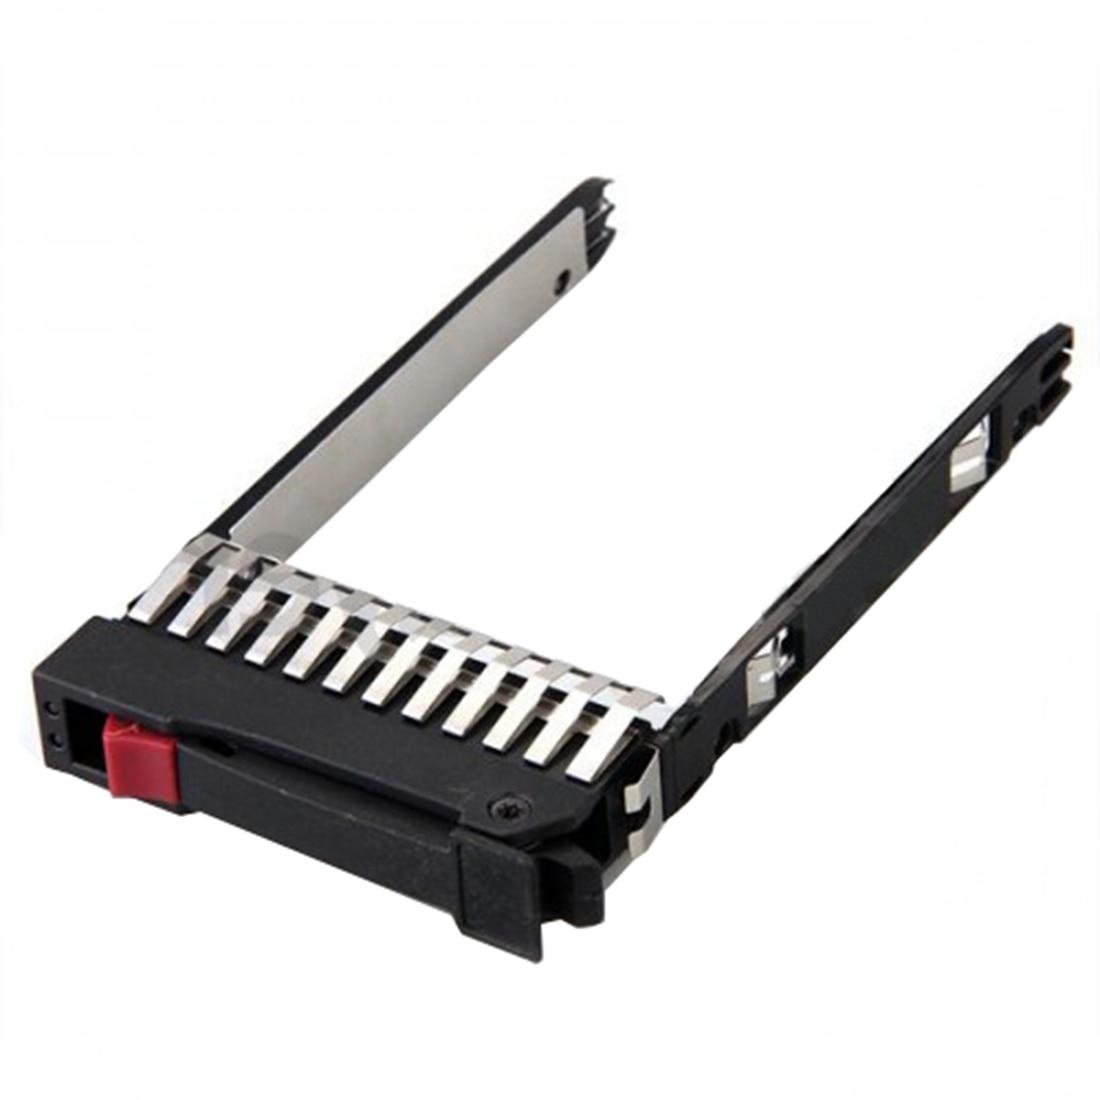 NOYOKERE 2.5 Hard Drive Tray Caddy Sled For Hp Dl380 G7 New Sas Sata Adapter Precision sas hard drive backplane for x3650m2 x3500m2 43v7070 46m0805 original 95